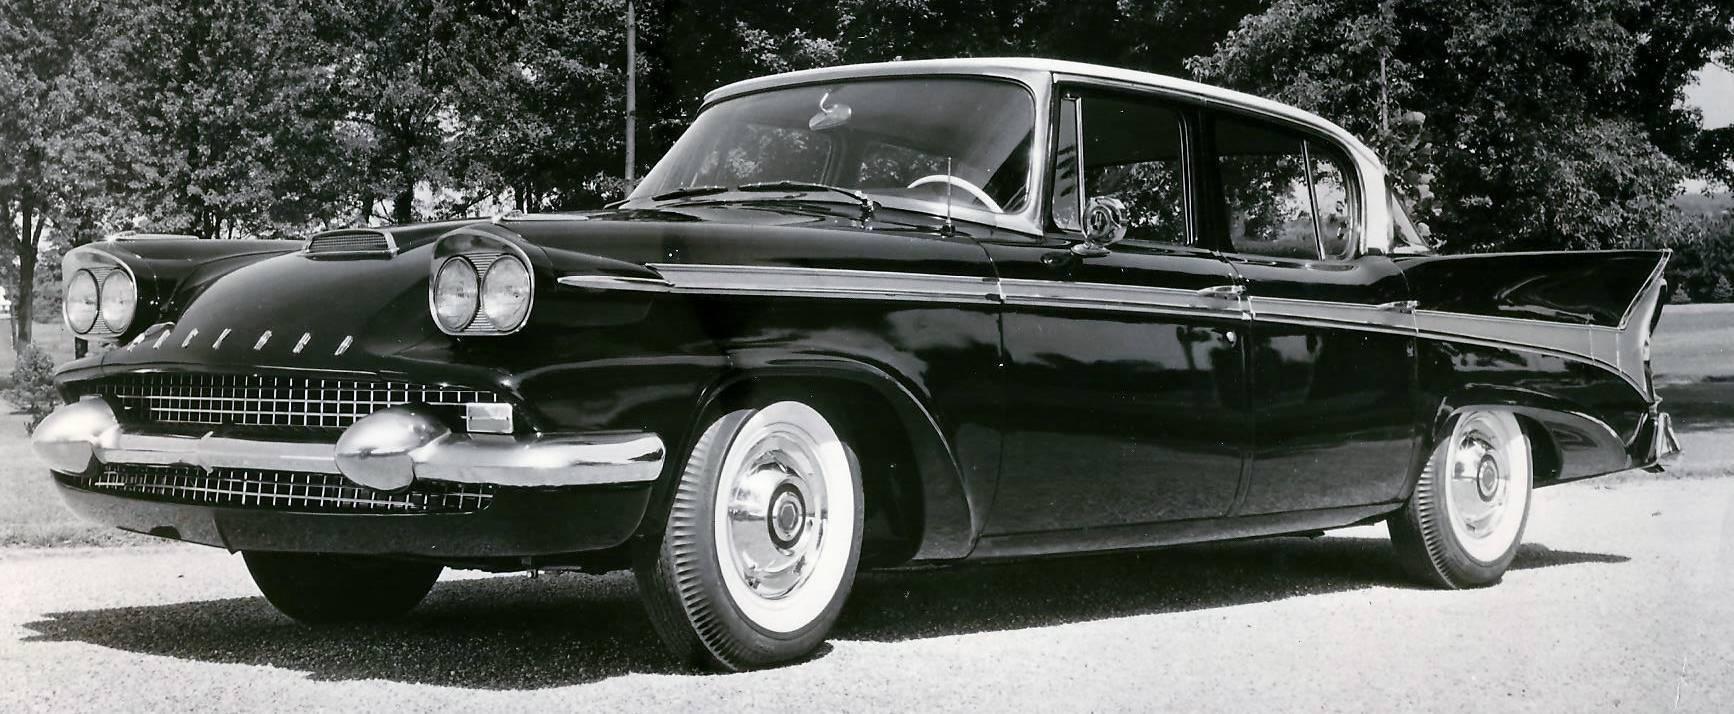 1958 Packard Four Door Town Sedan